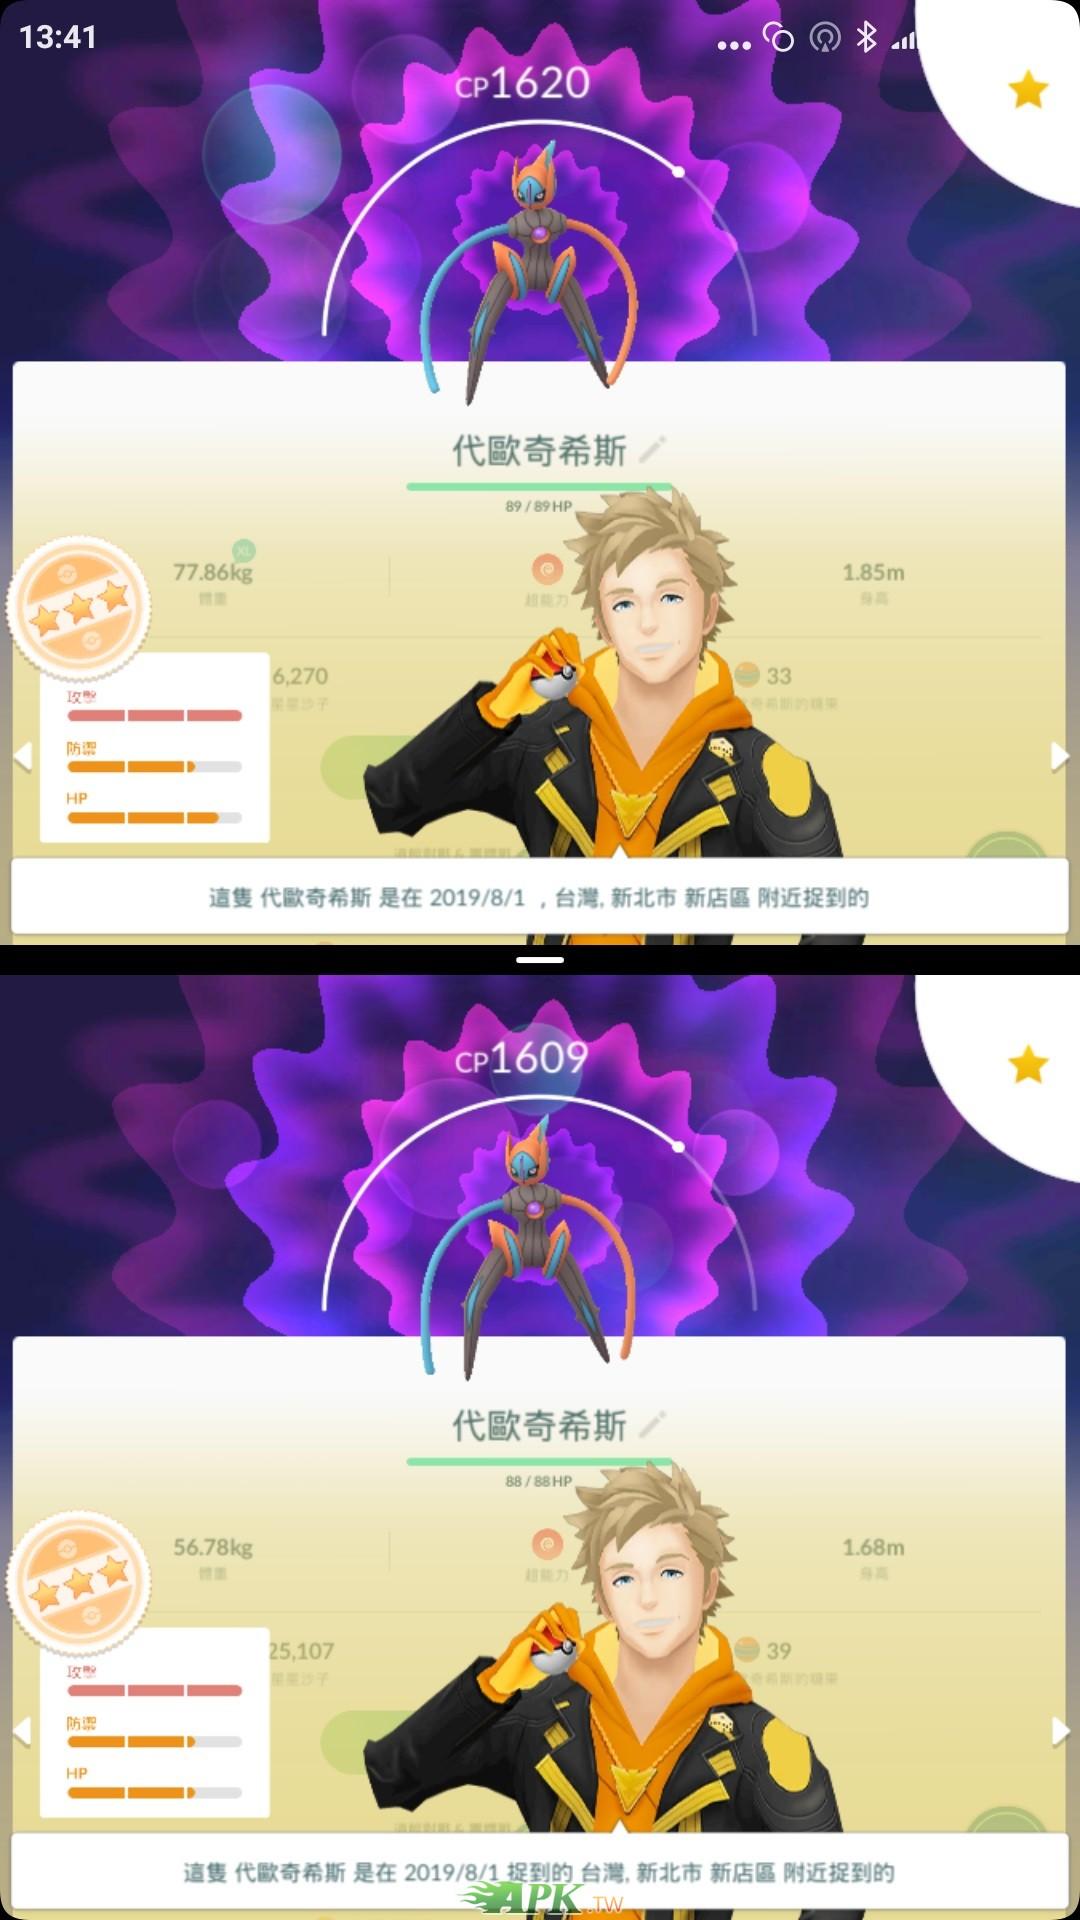 Screenshot_2019-08-01-13-41-36-548_com.nianticlabs.pokemongo.jpg